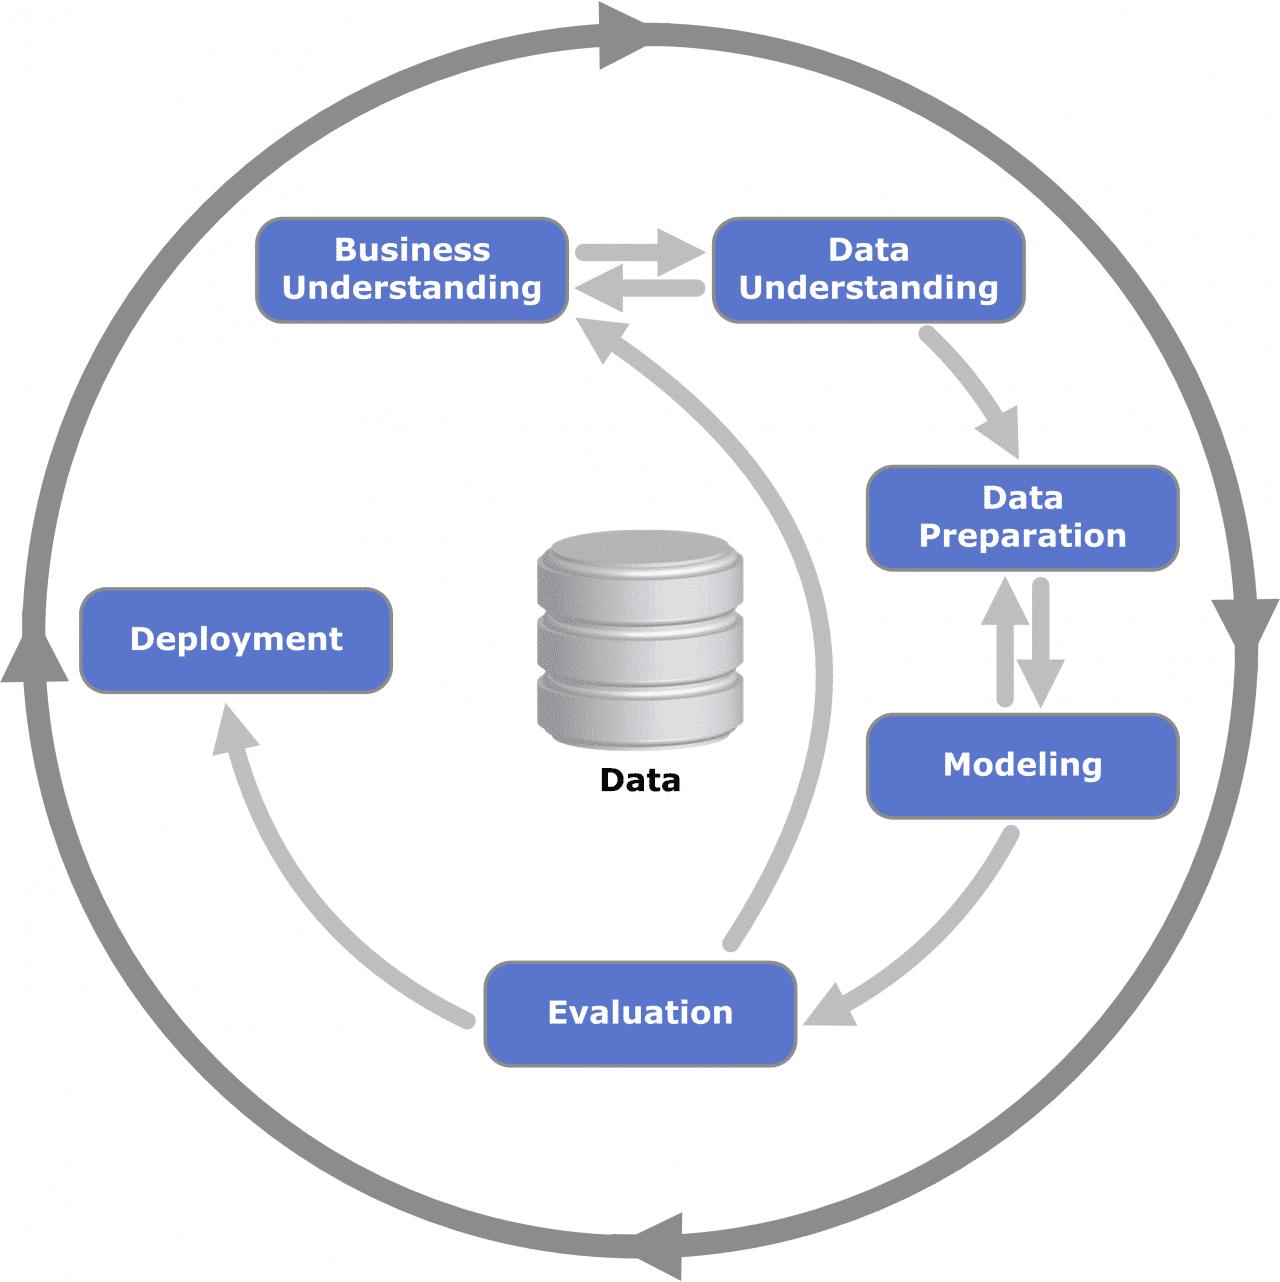 CRISP-DM_Process_Diagram1